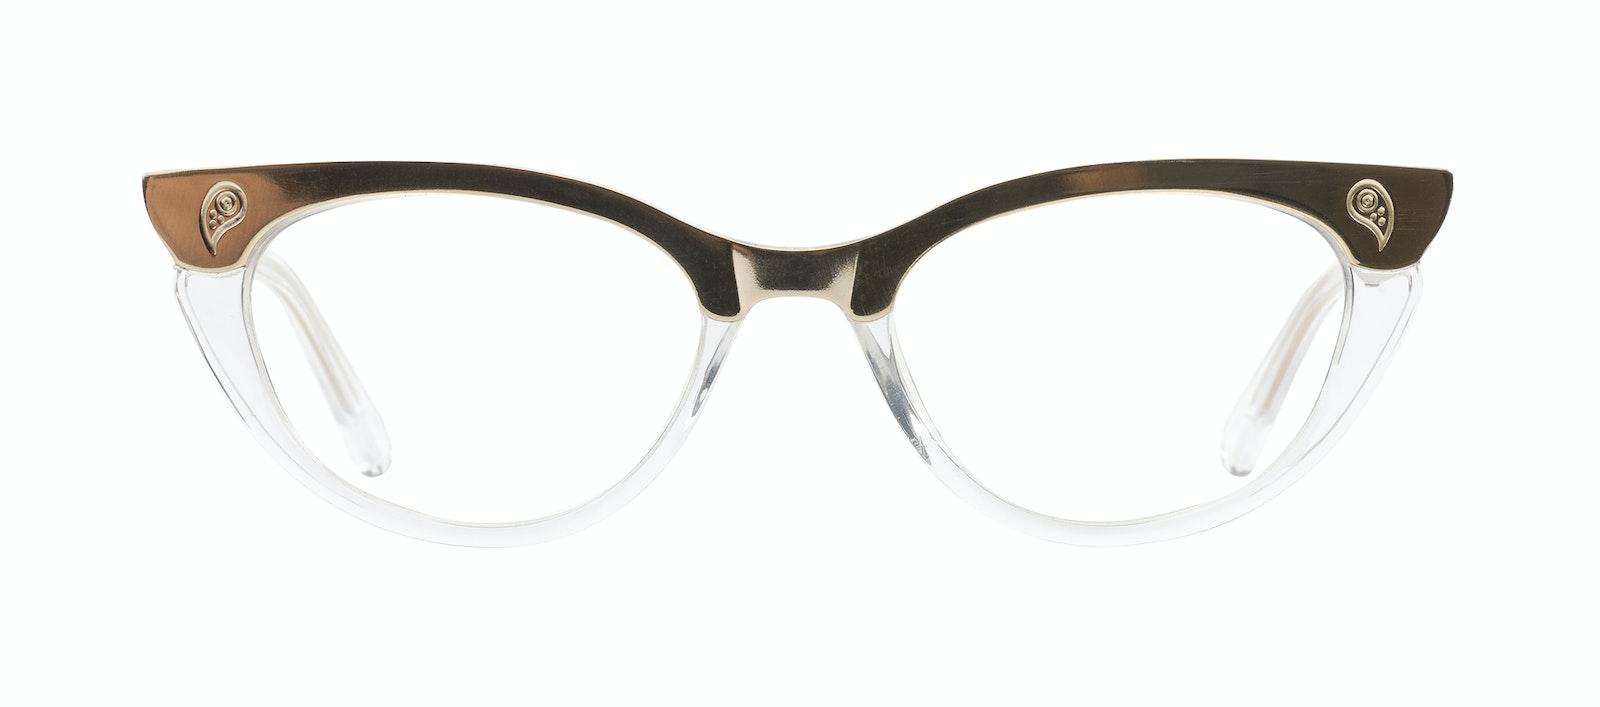 0b0360d5912 Affordable Fashion Glasses Cat Eye Daring Cateye Eyeglasses Women Bad Beti  Babbu Front